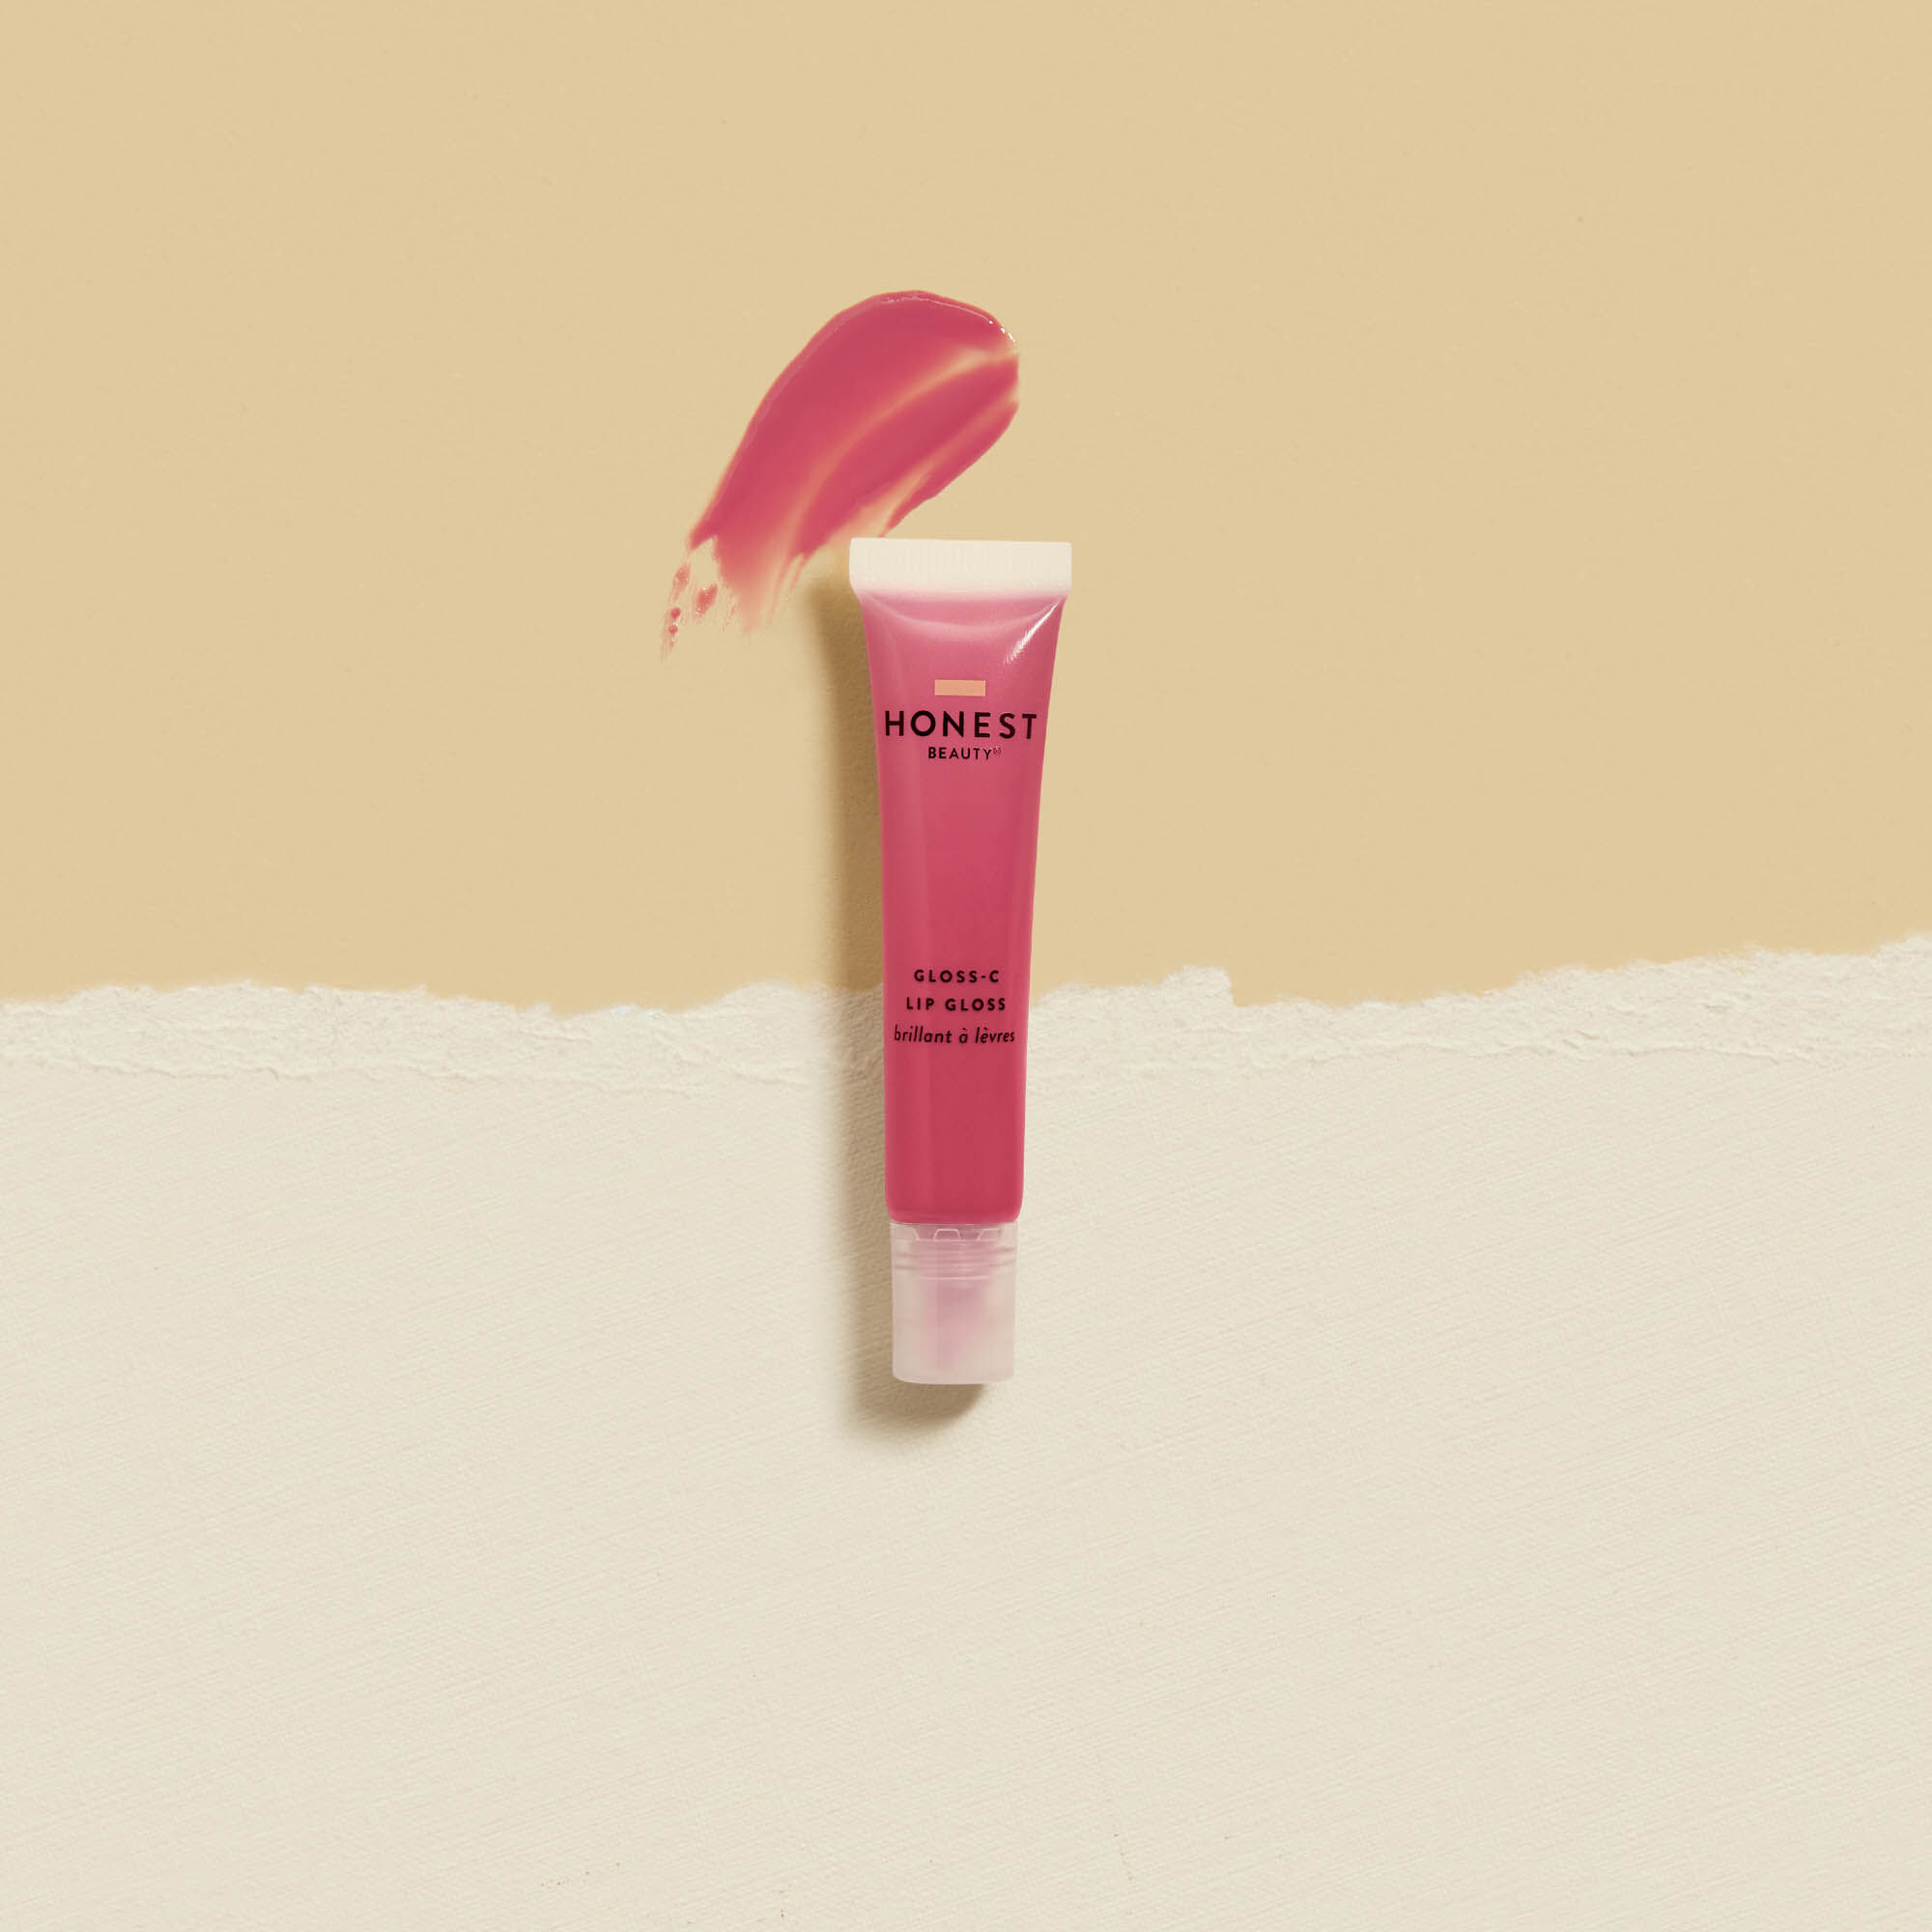 Gloss-C Lip Gloss, Pink Agate